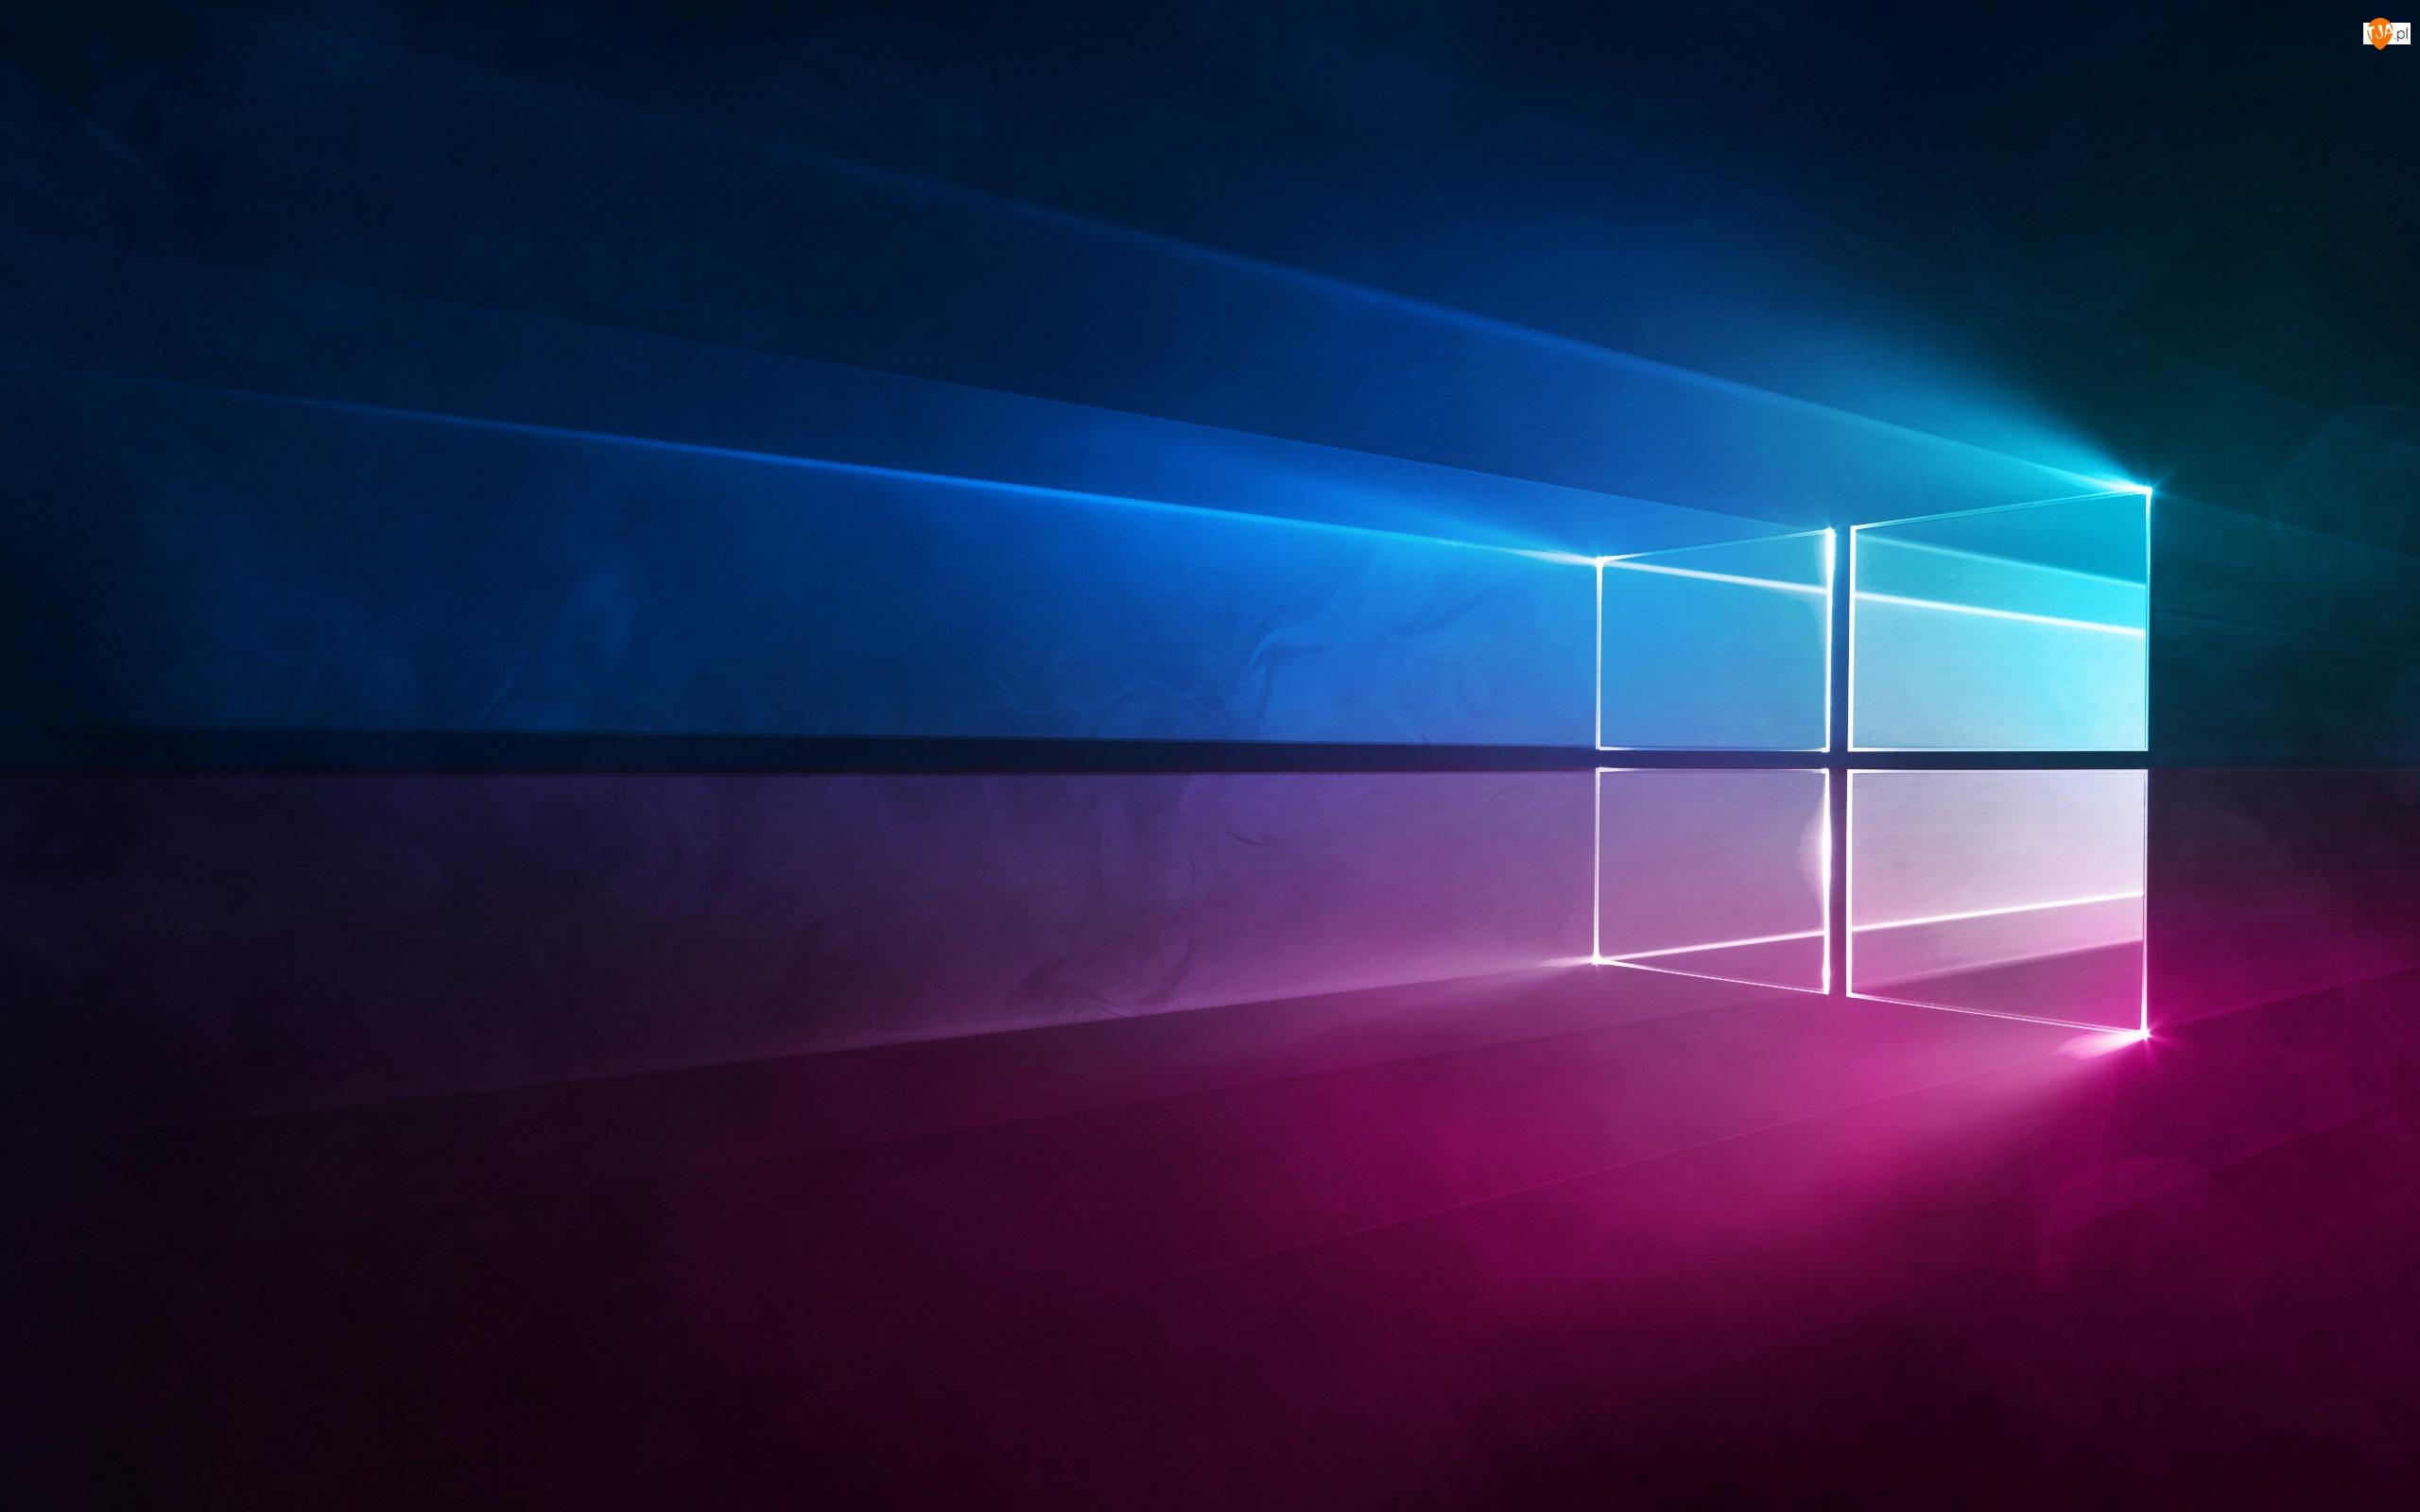 Windows 10, System